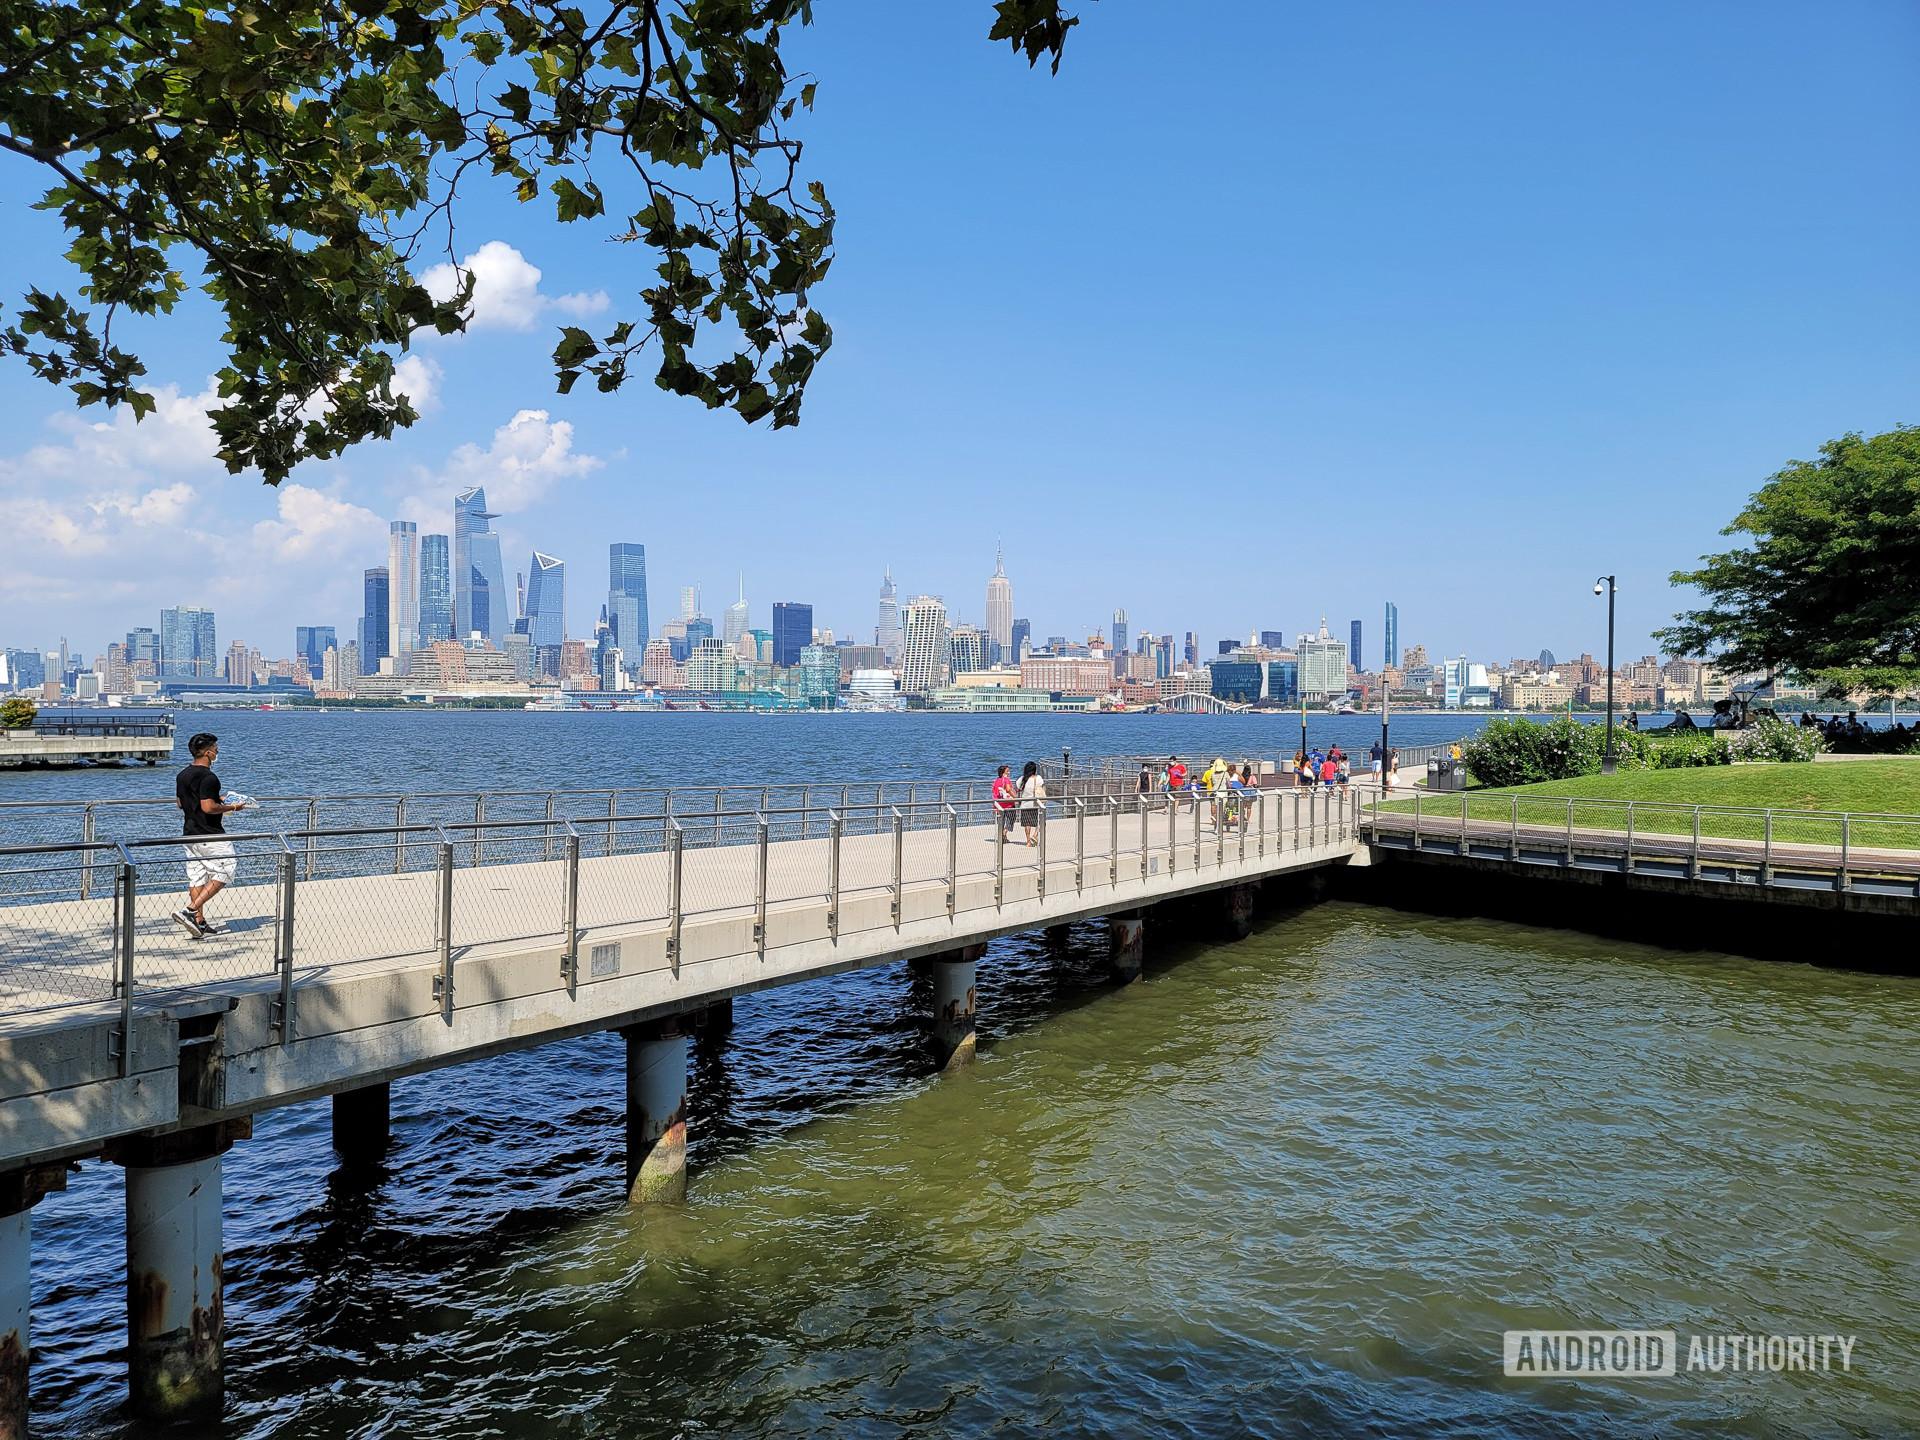 Samsung Galaxy Note 20 Ultra Photo Sample Hoboken Park 1